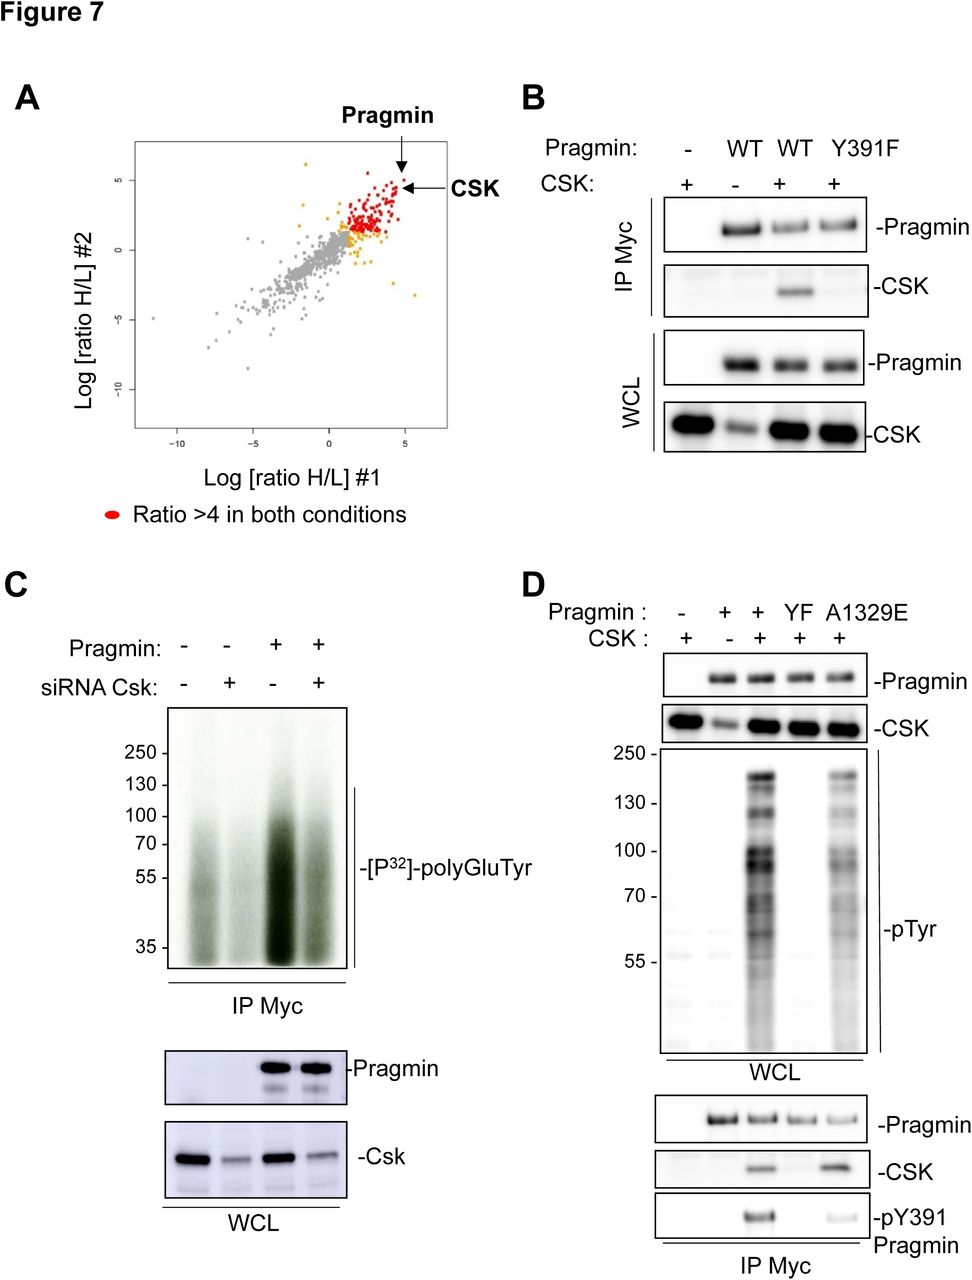 Dimerization of the Pragmin pseudo-kinase regulates protein tyrosine